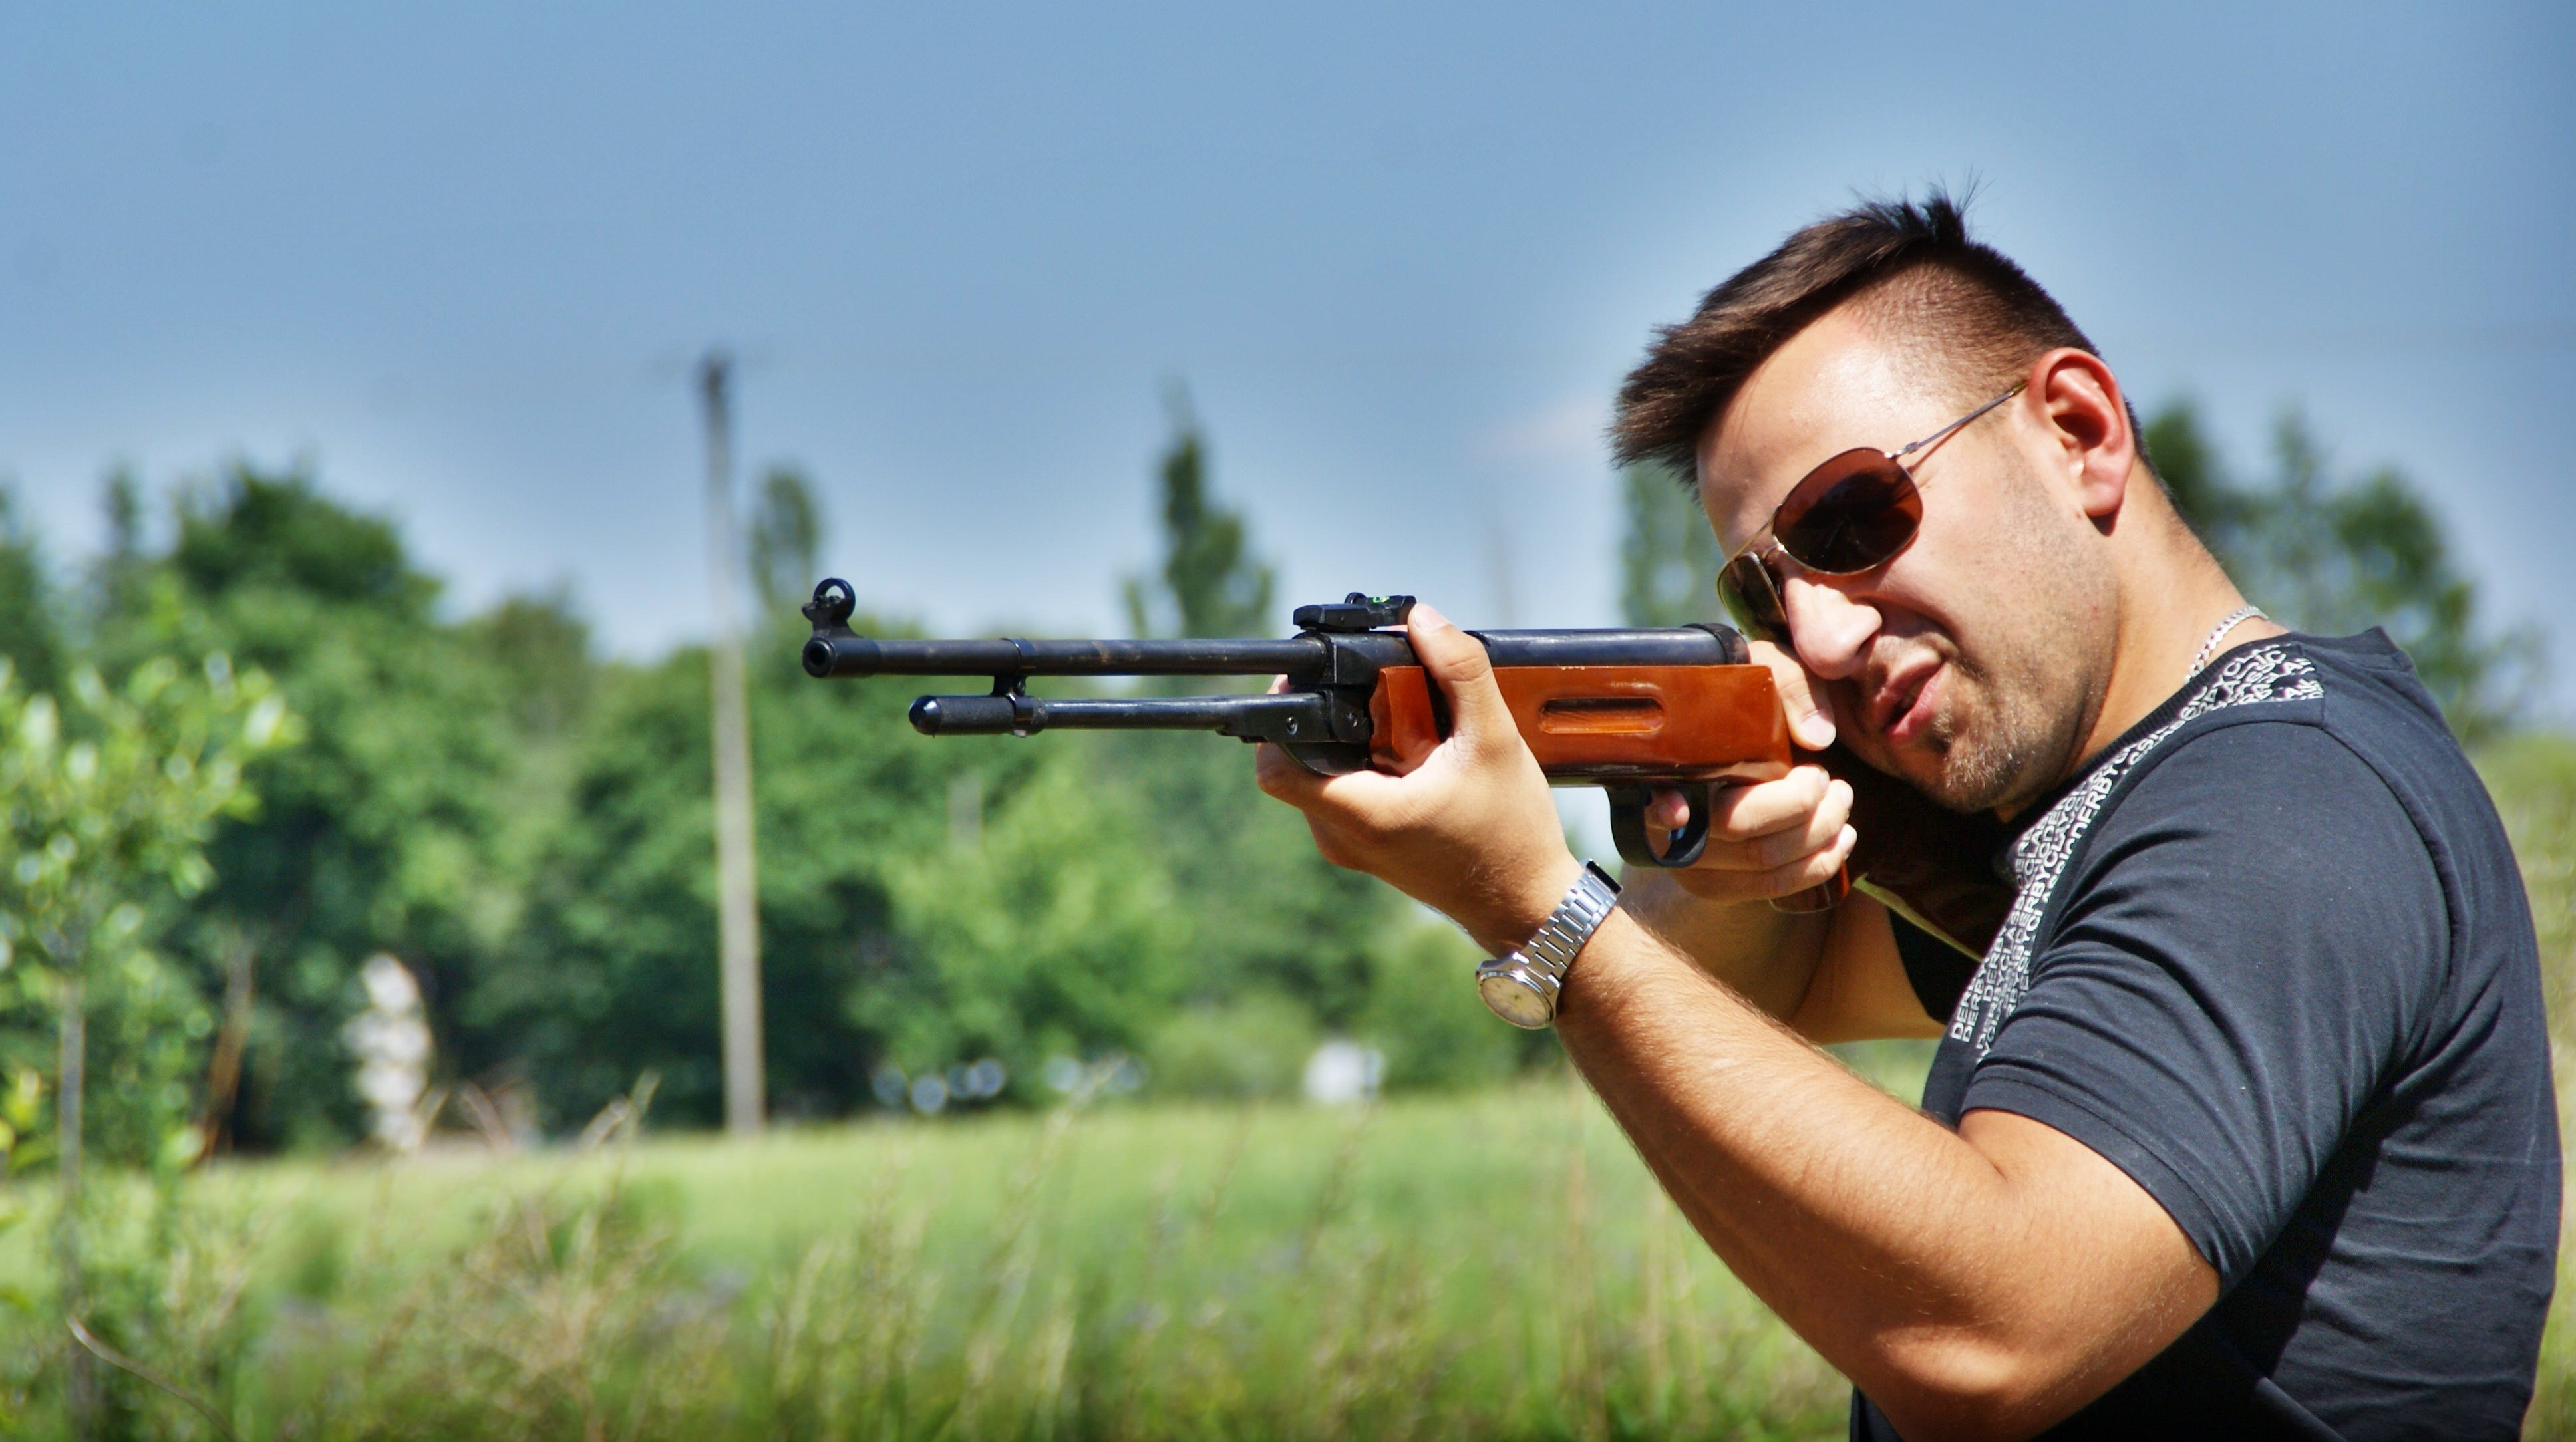 United nations hiring disarmament officers to take american guns